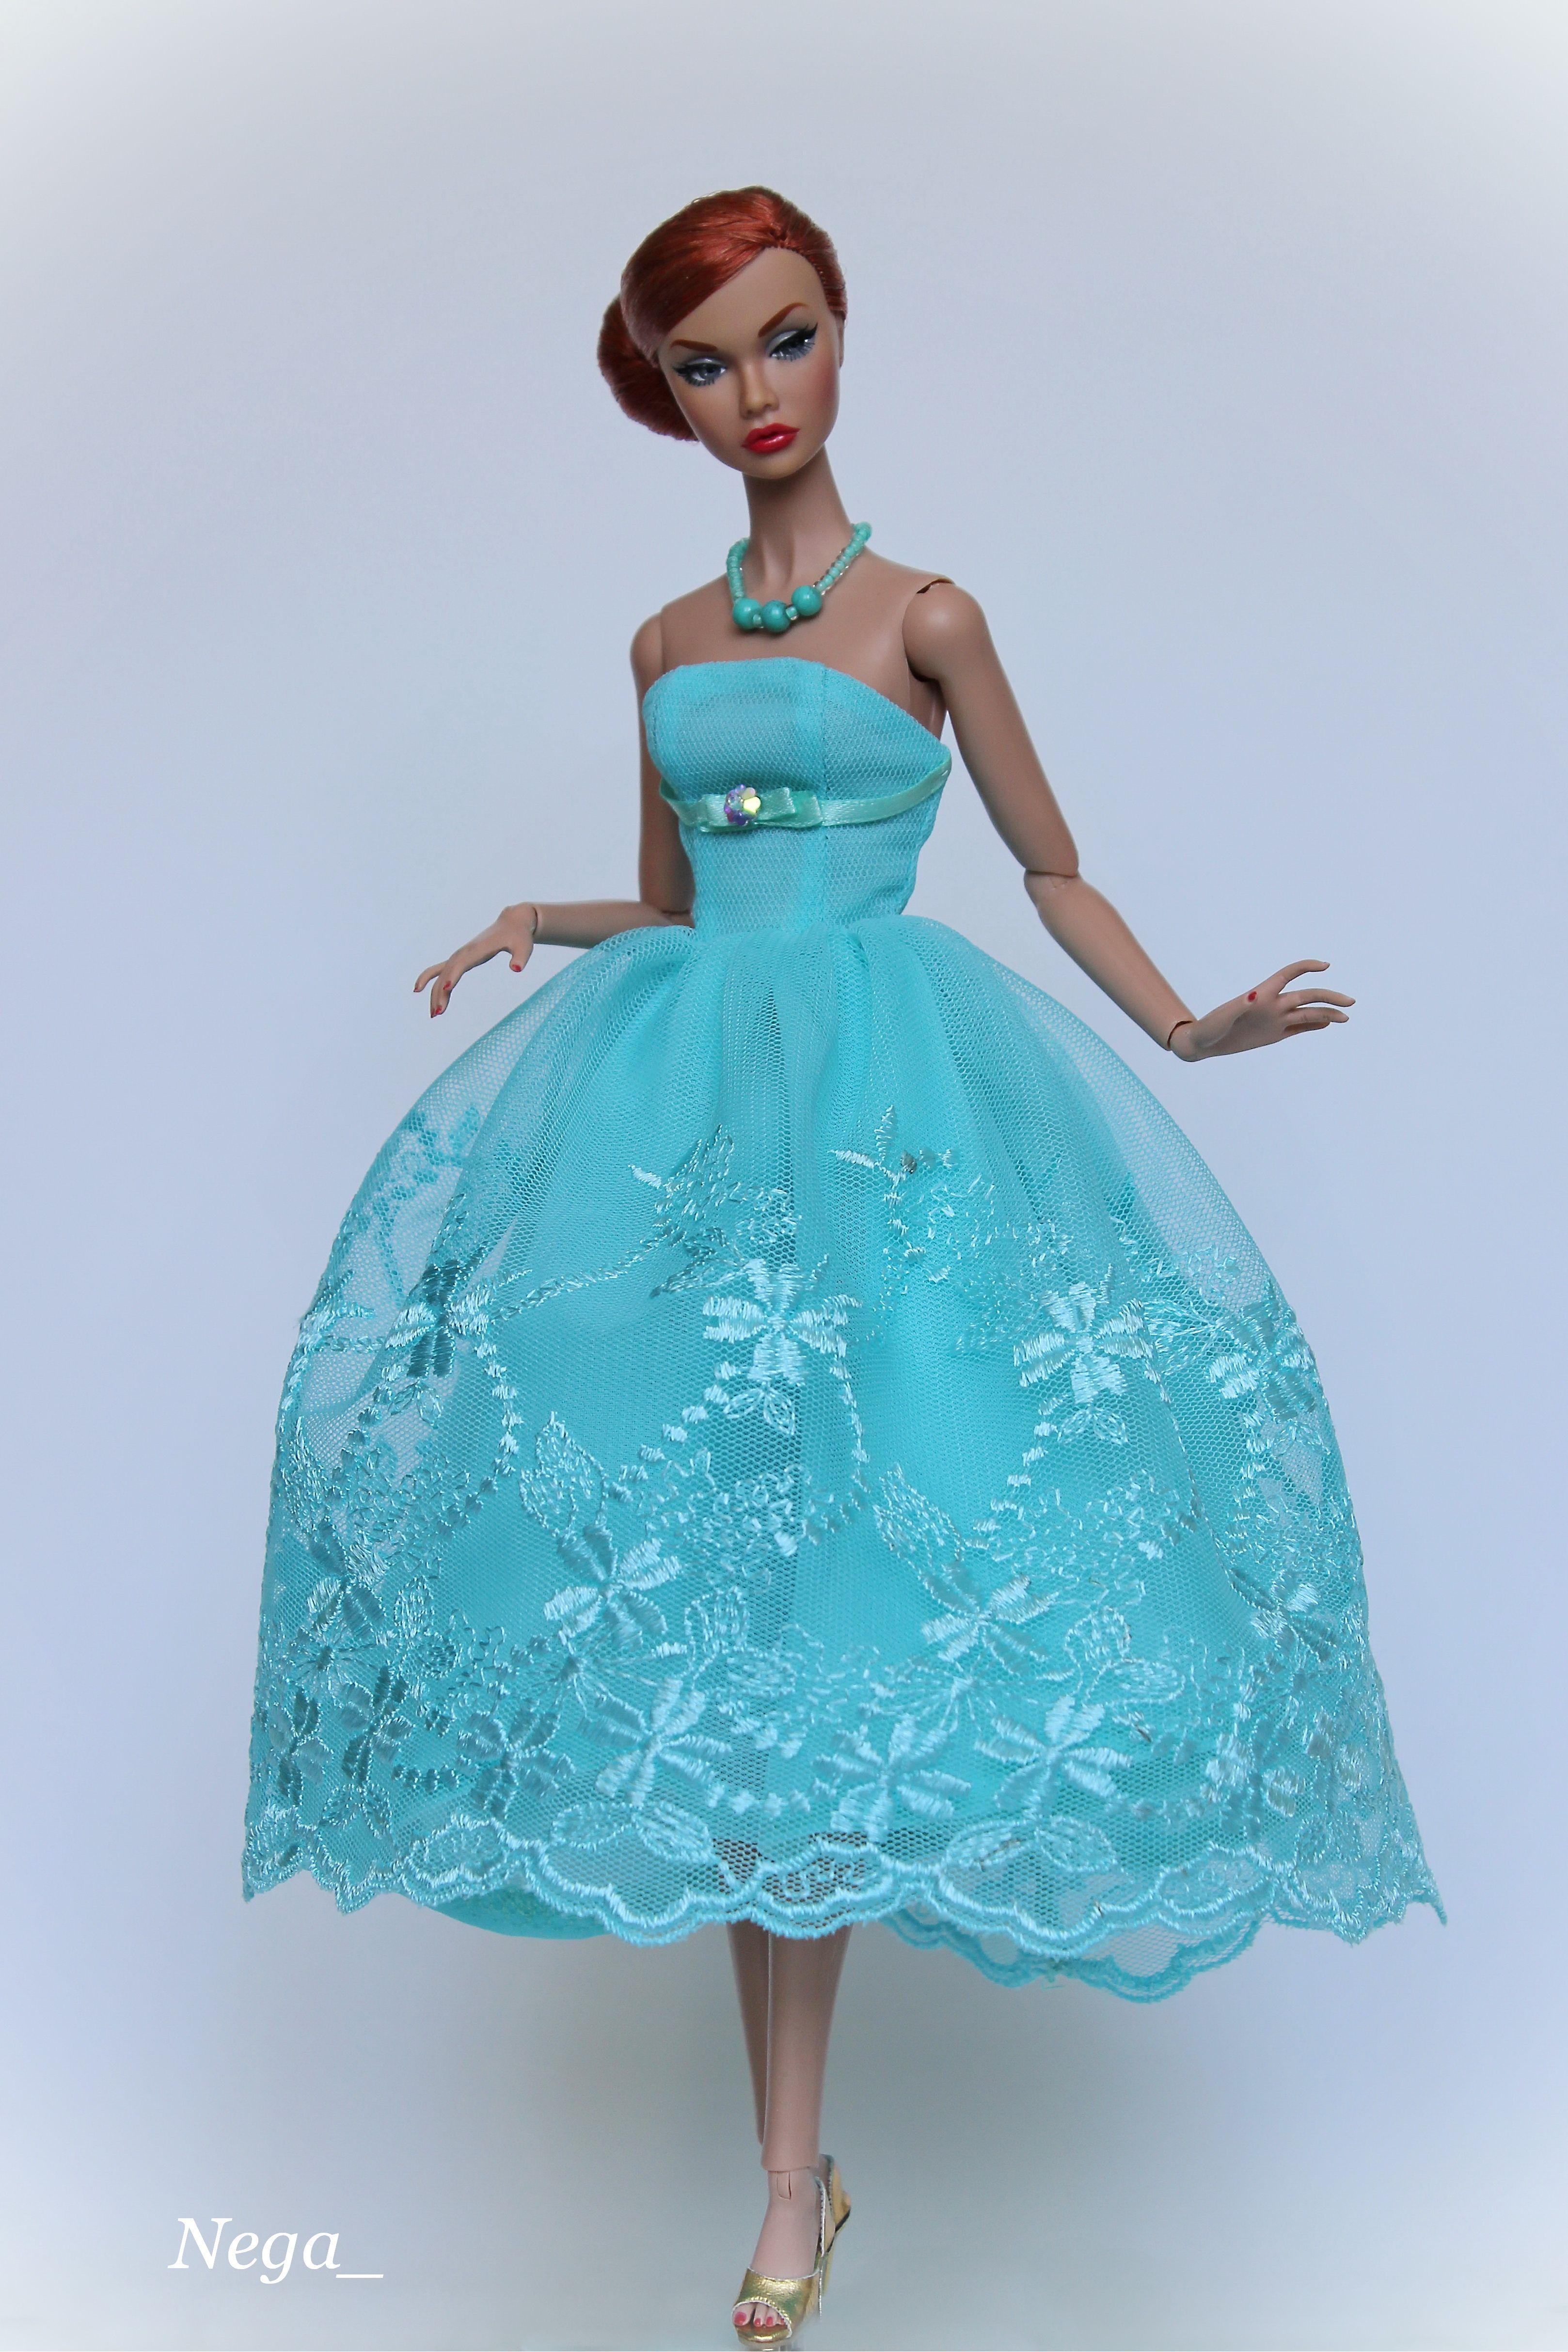 35.16.5 // Yana   Barbie/Doll Dresses! IV   Pinterest   Fashion ...